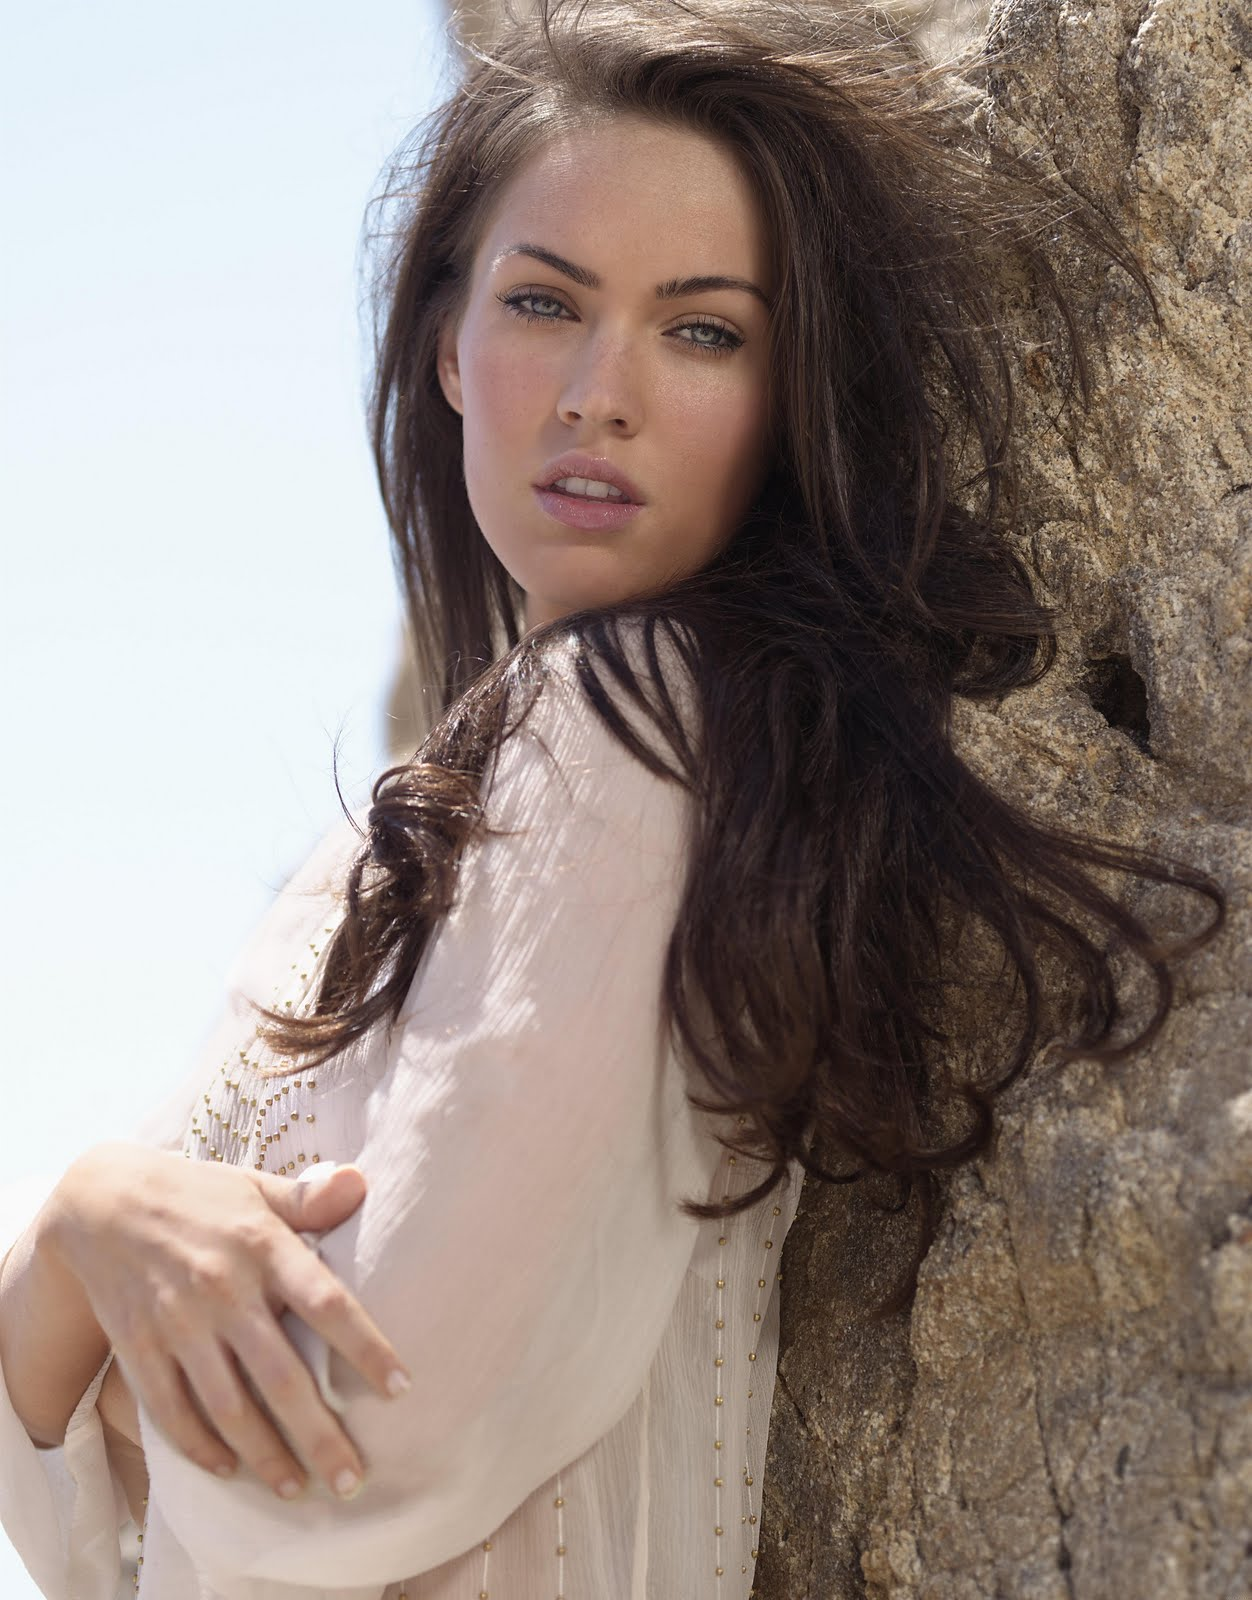 http://3.bp.blogspot.com/-9xGQqOBfWKM/Tbl9wuNVGXI/AAAAAAAAAlY/-qLEVI3nrp4/s1600/Megan_Fox_21.jpg